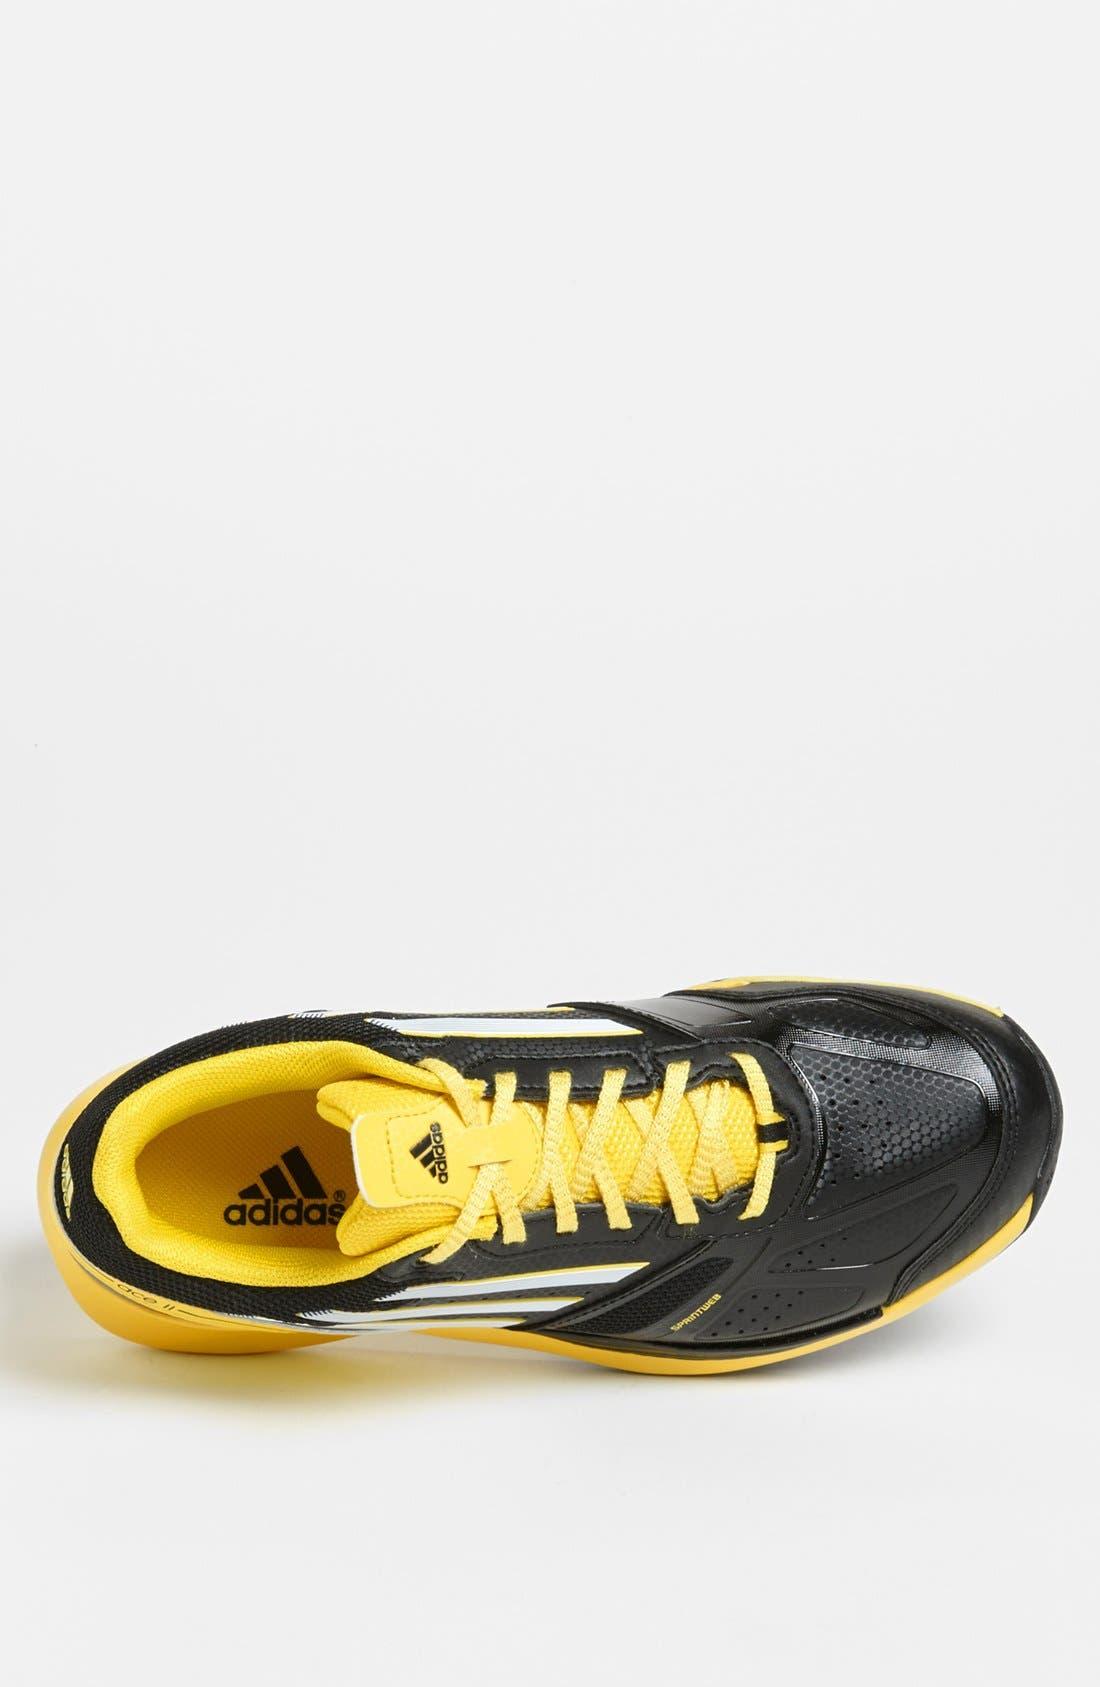 Alternate Image 3  - adidas 'adiZero Ace II' Tennis Shoe (Men)